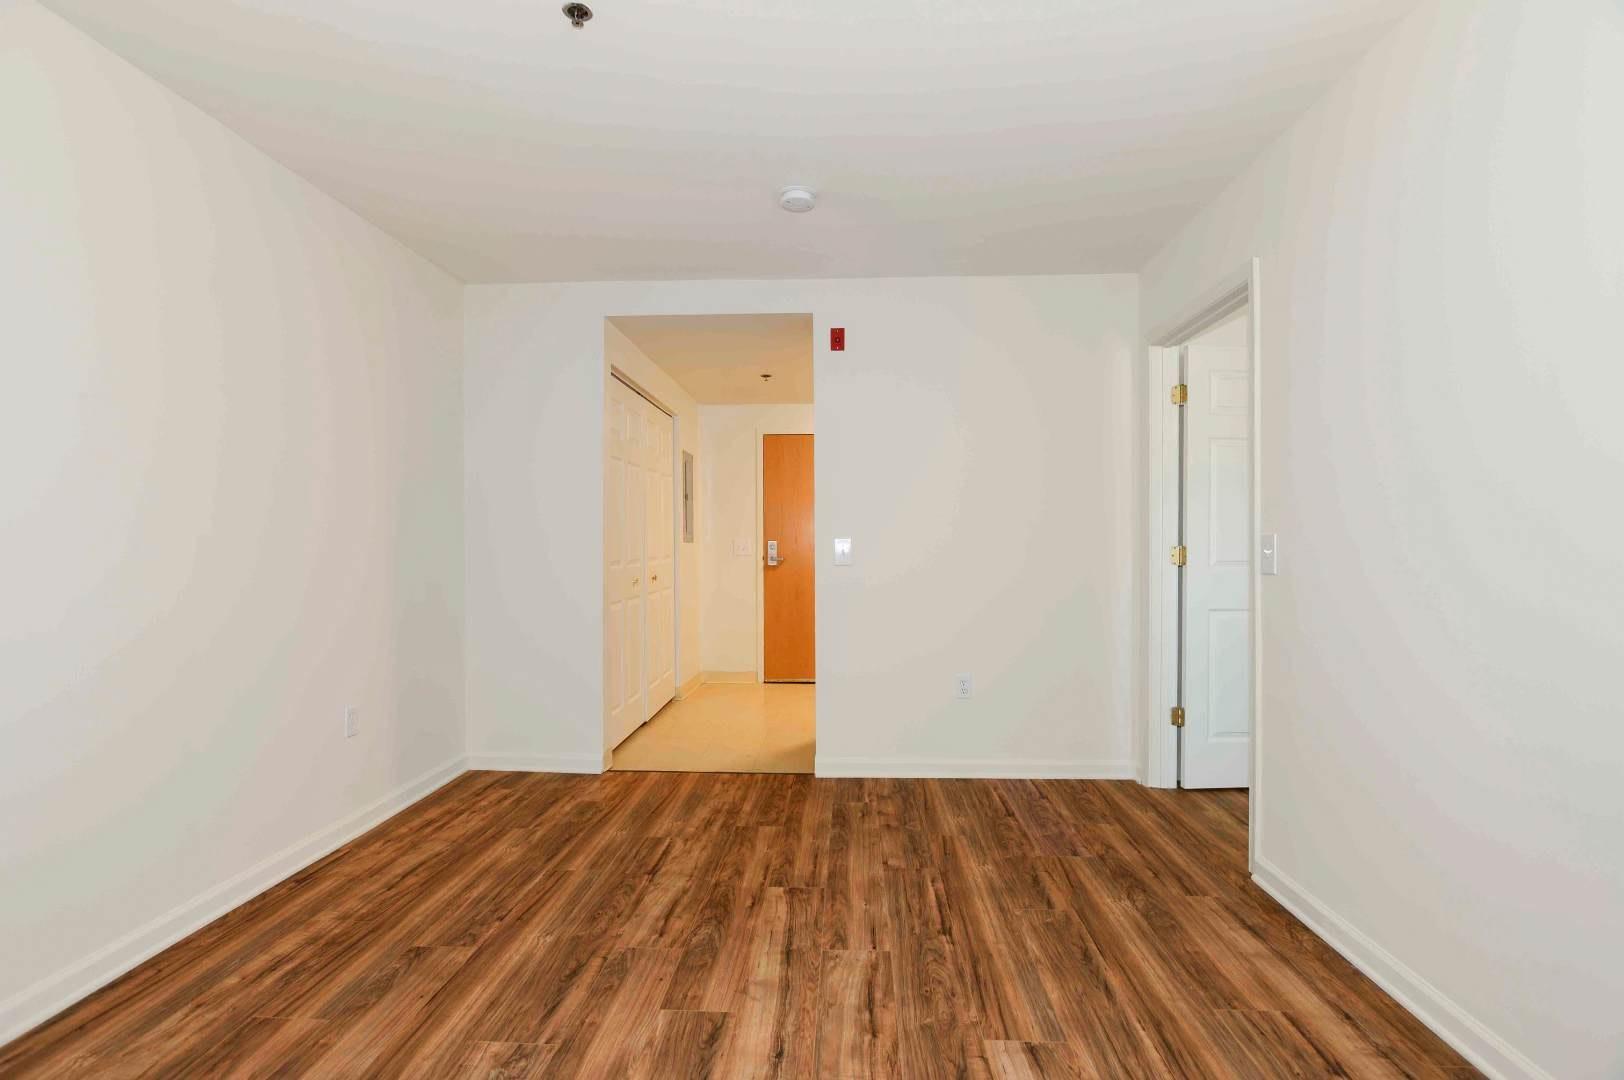 Photo 1 of Warren Place Senior Apartments